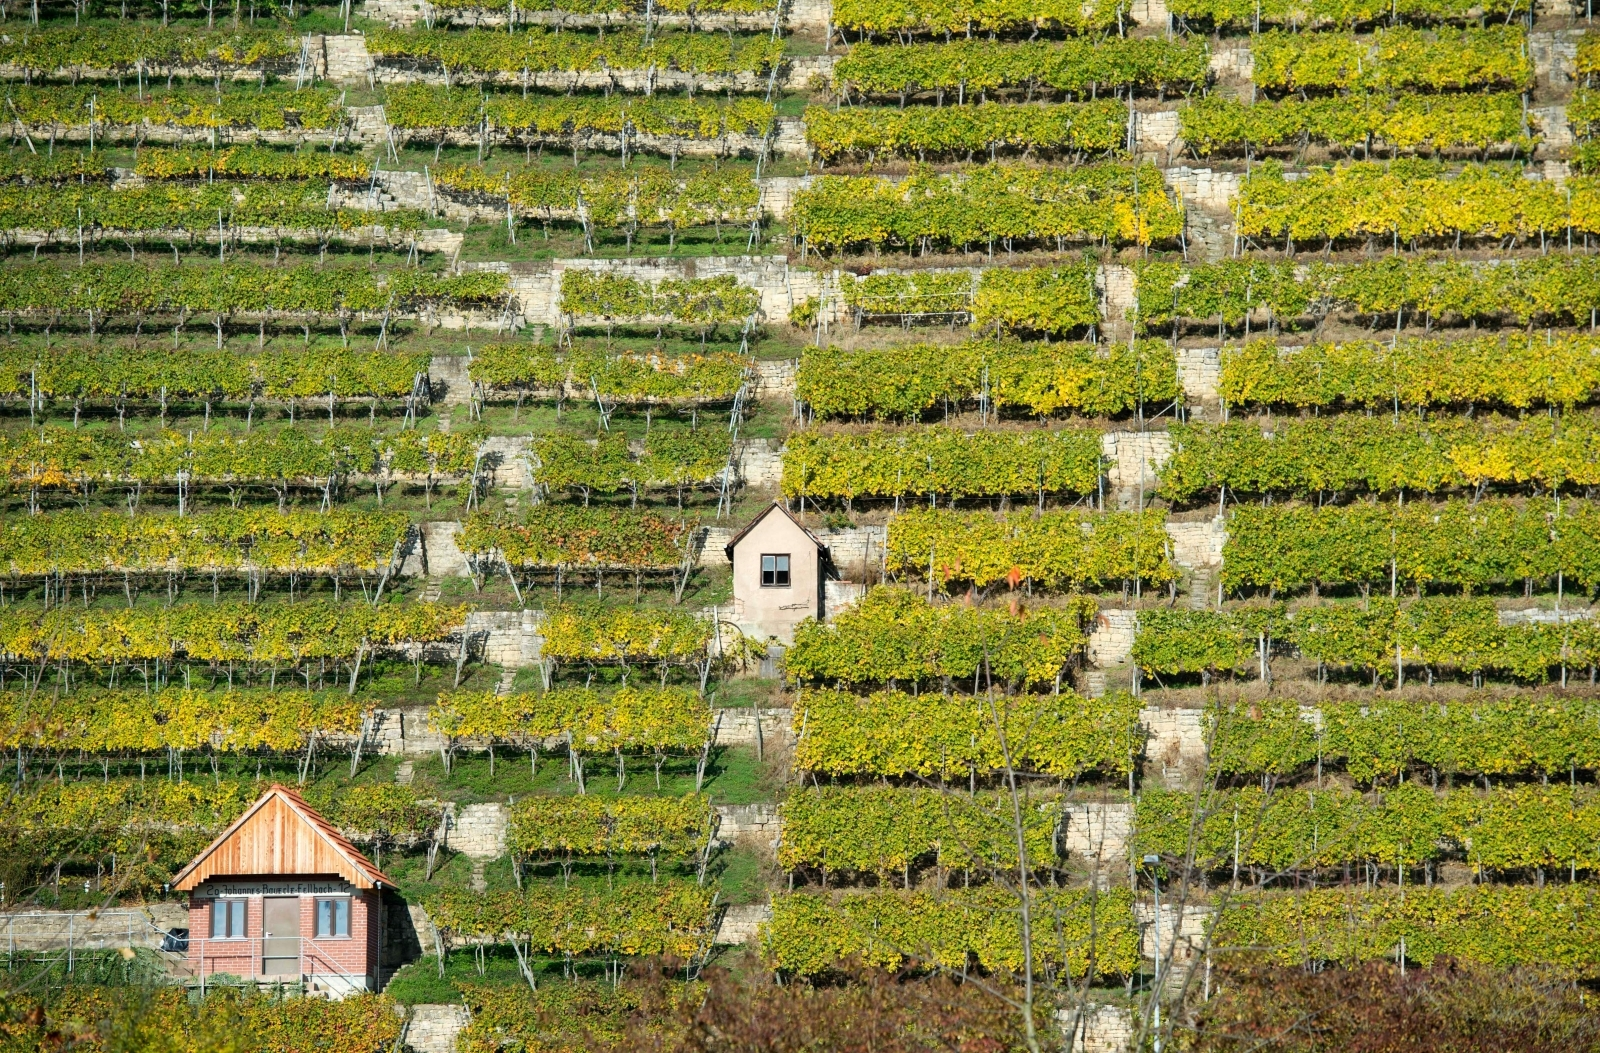 Stuttgart vineyard